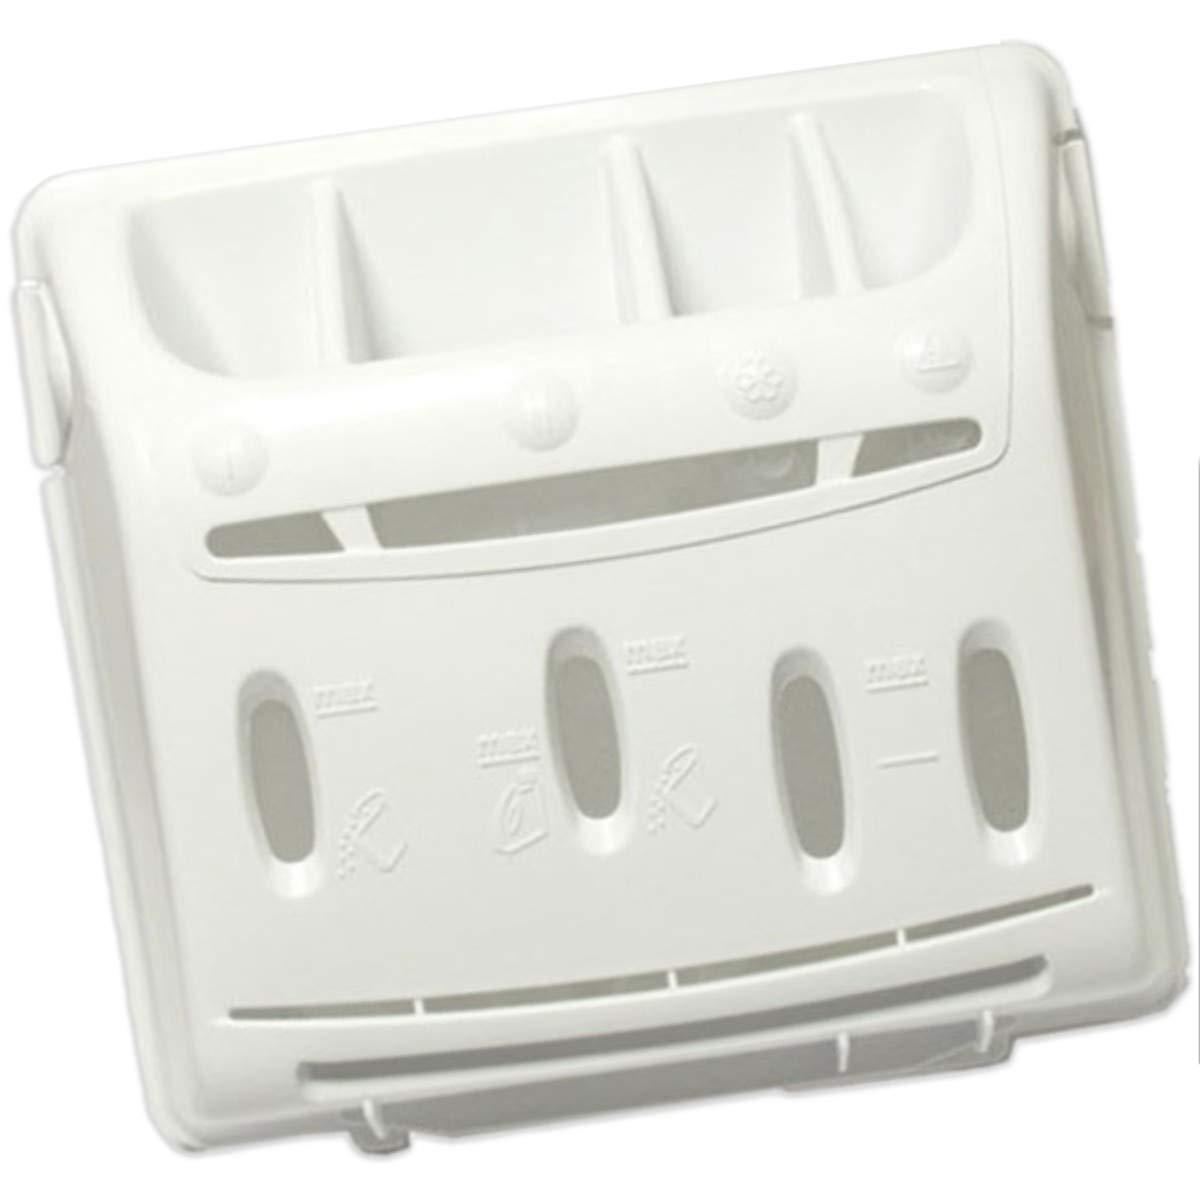 Caja de productos - Lavadora - Brandt, Vedette, Fagor, Thomson ...